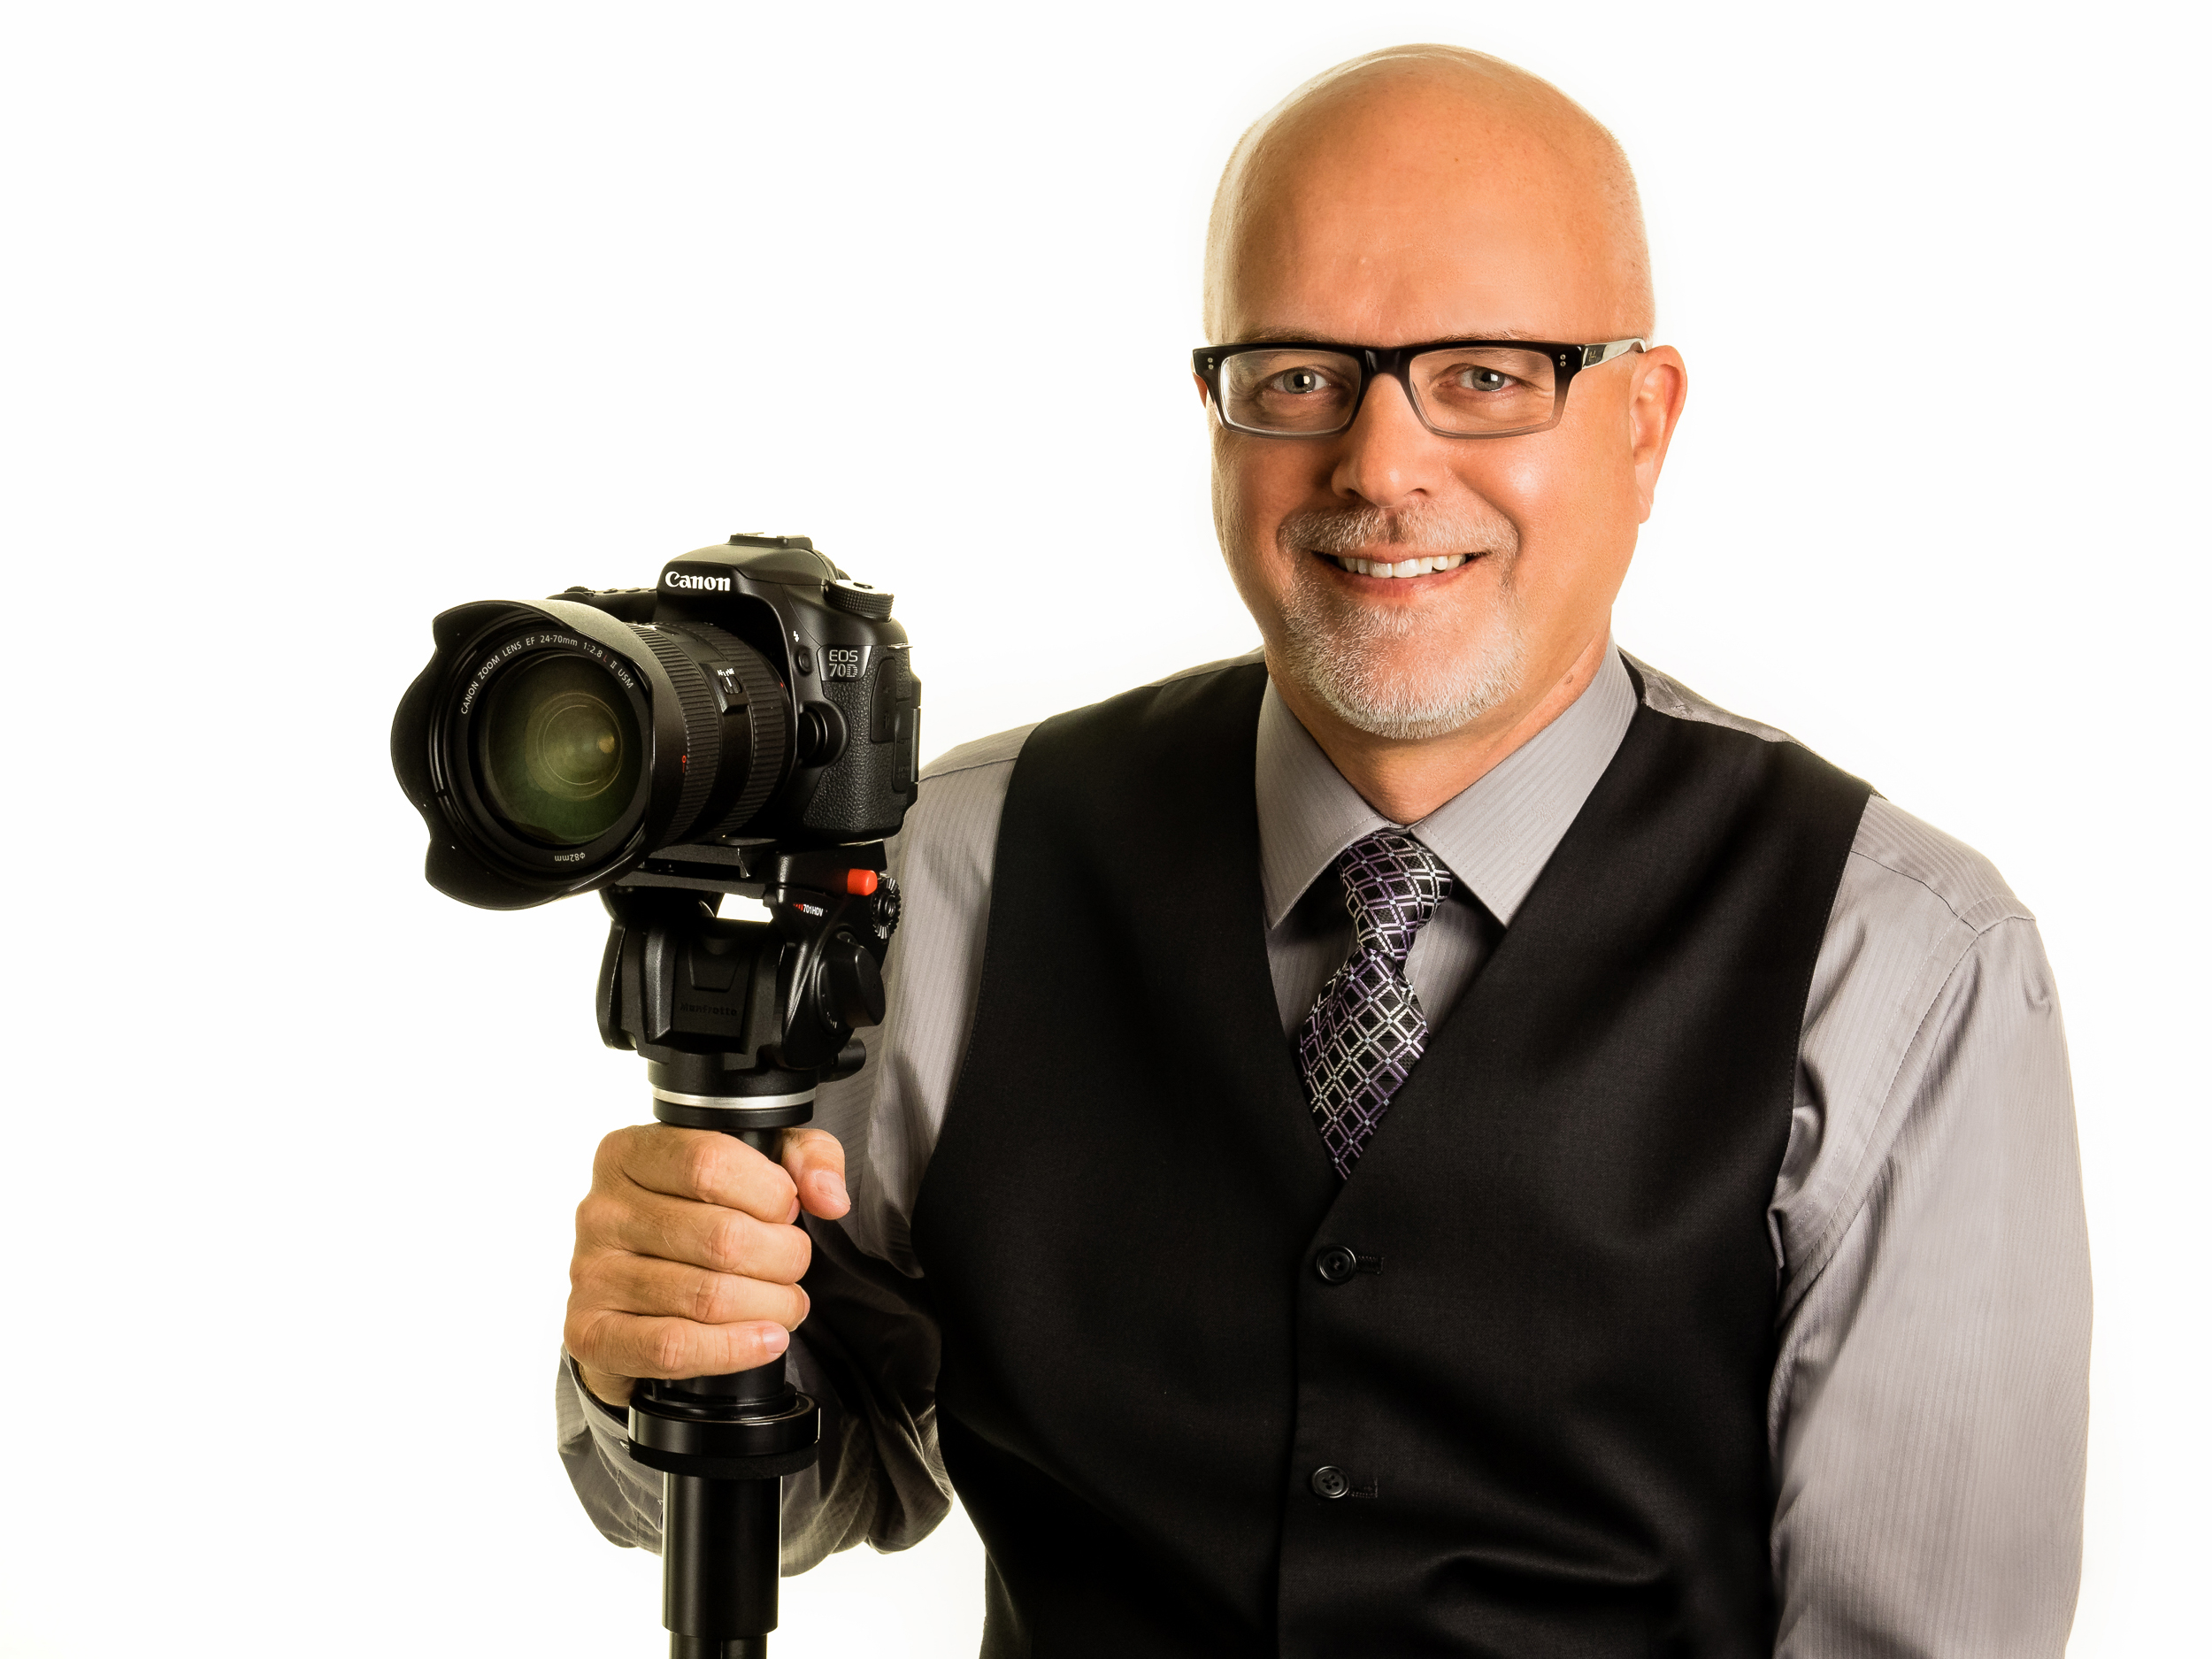 Publicity photo for a pro videographer.